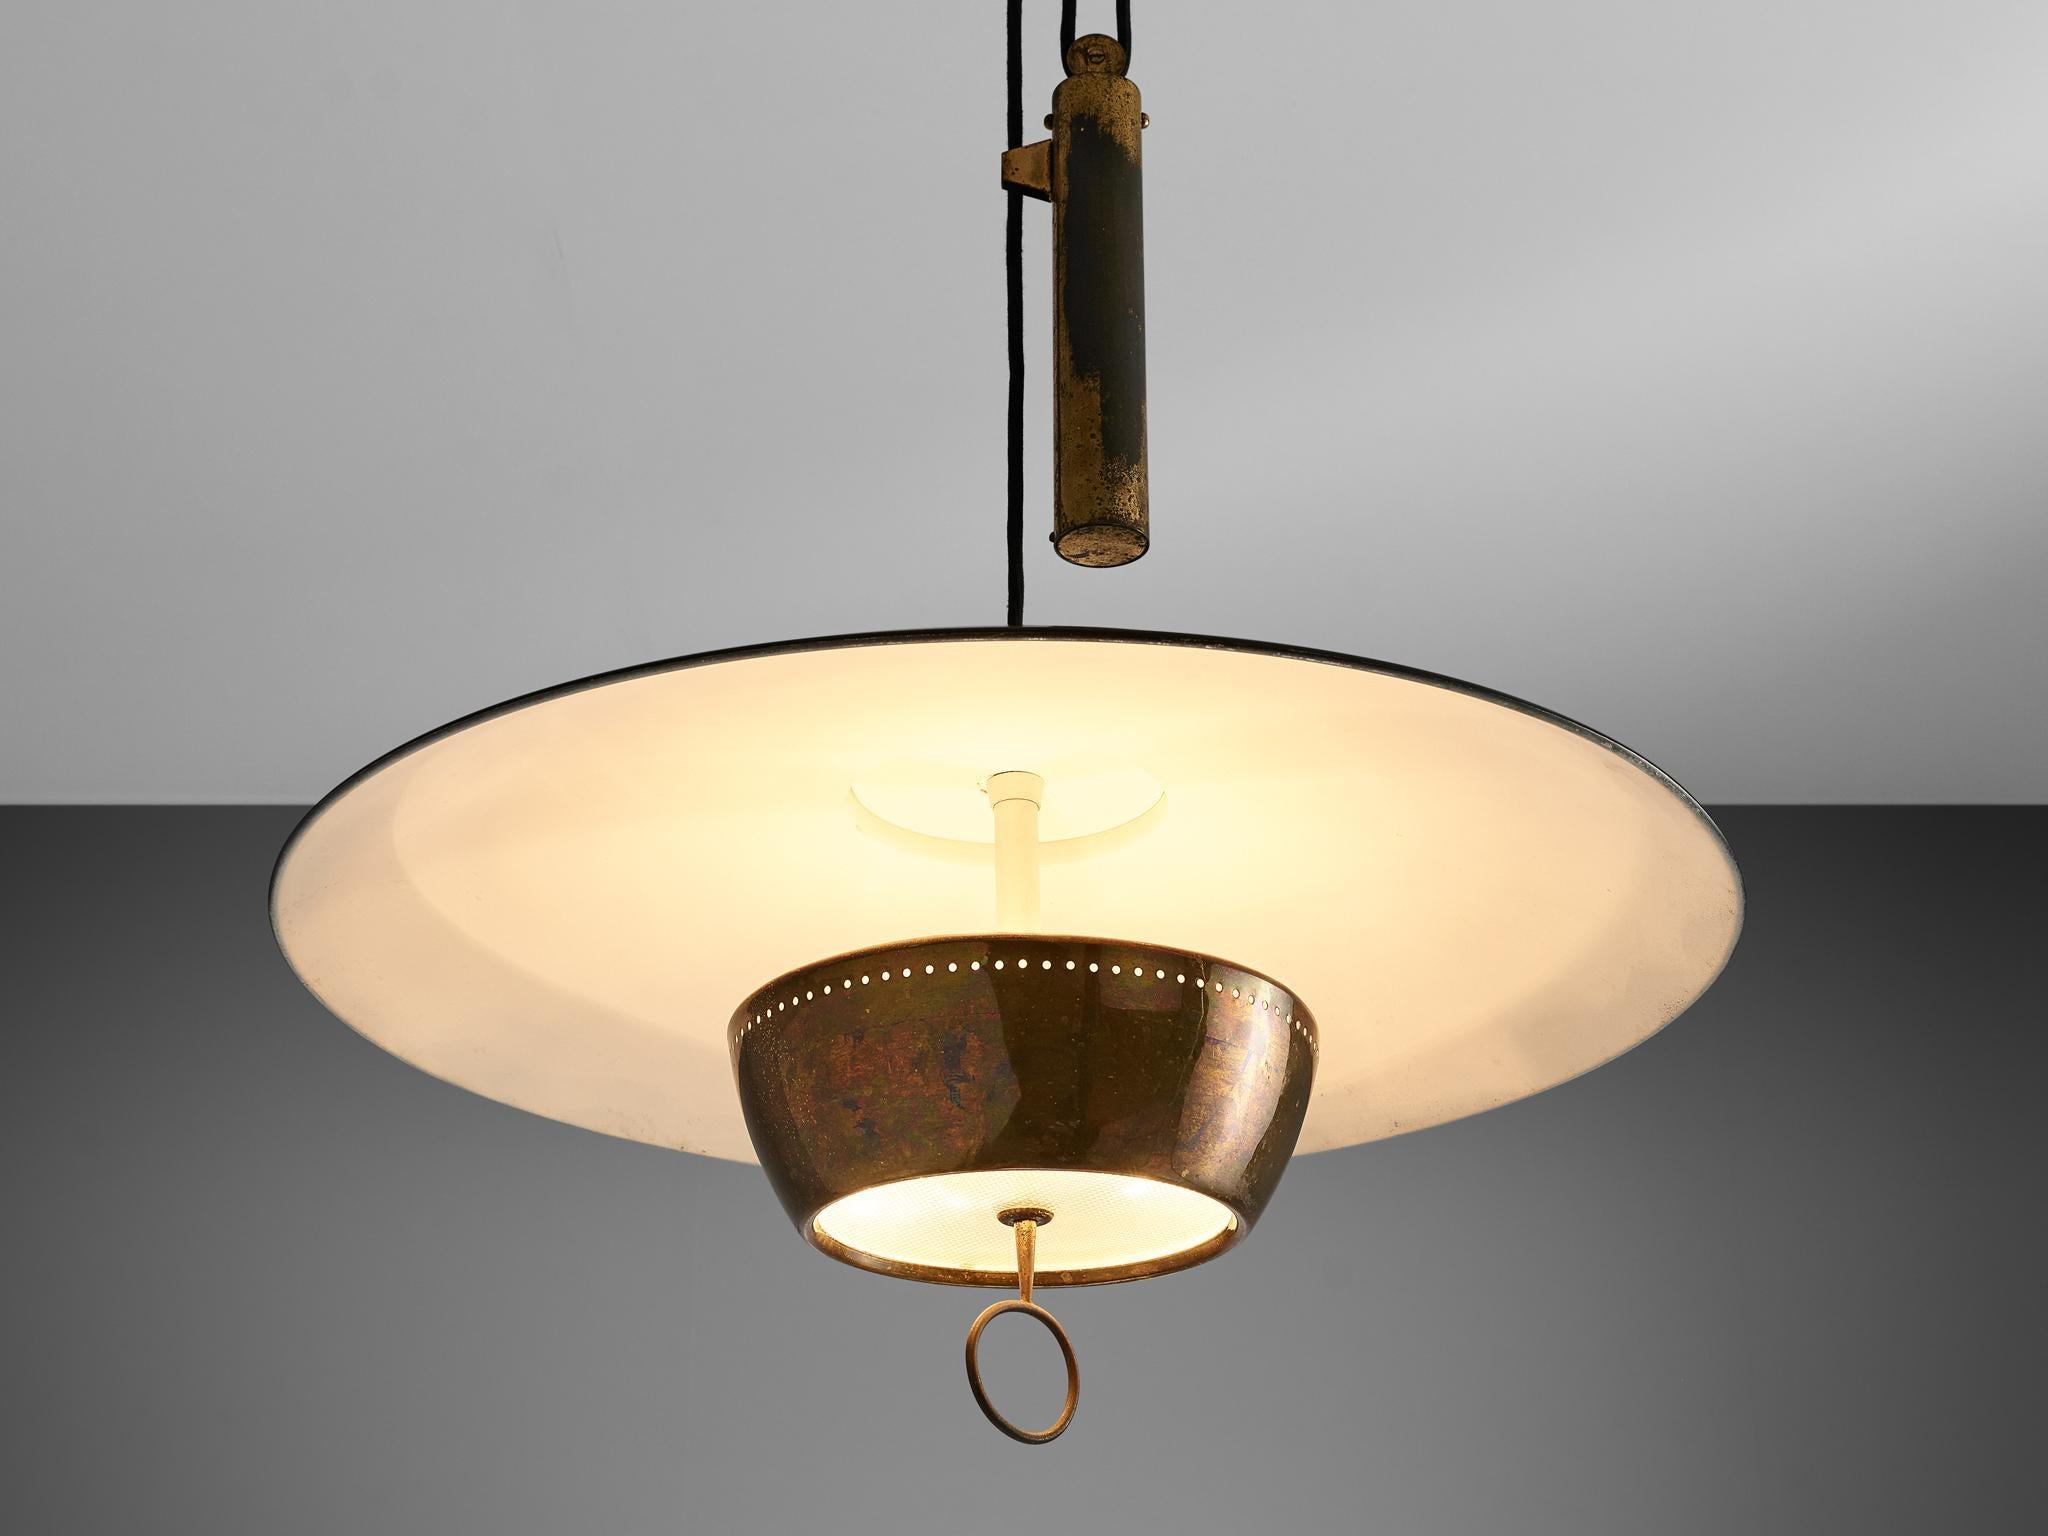 Gaetano Sciolari For Stilnovo Ceiling Lamp A5011 For Sale At 1stdibs